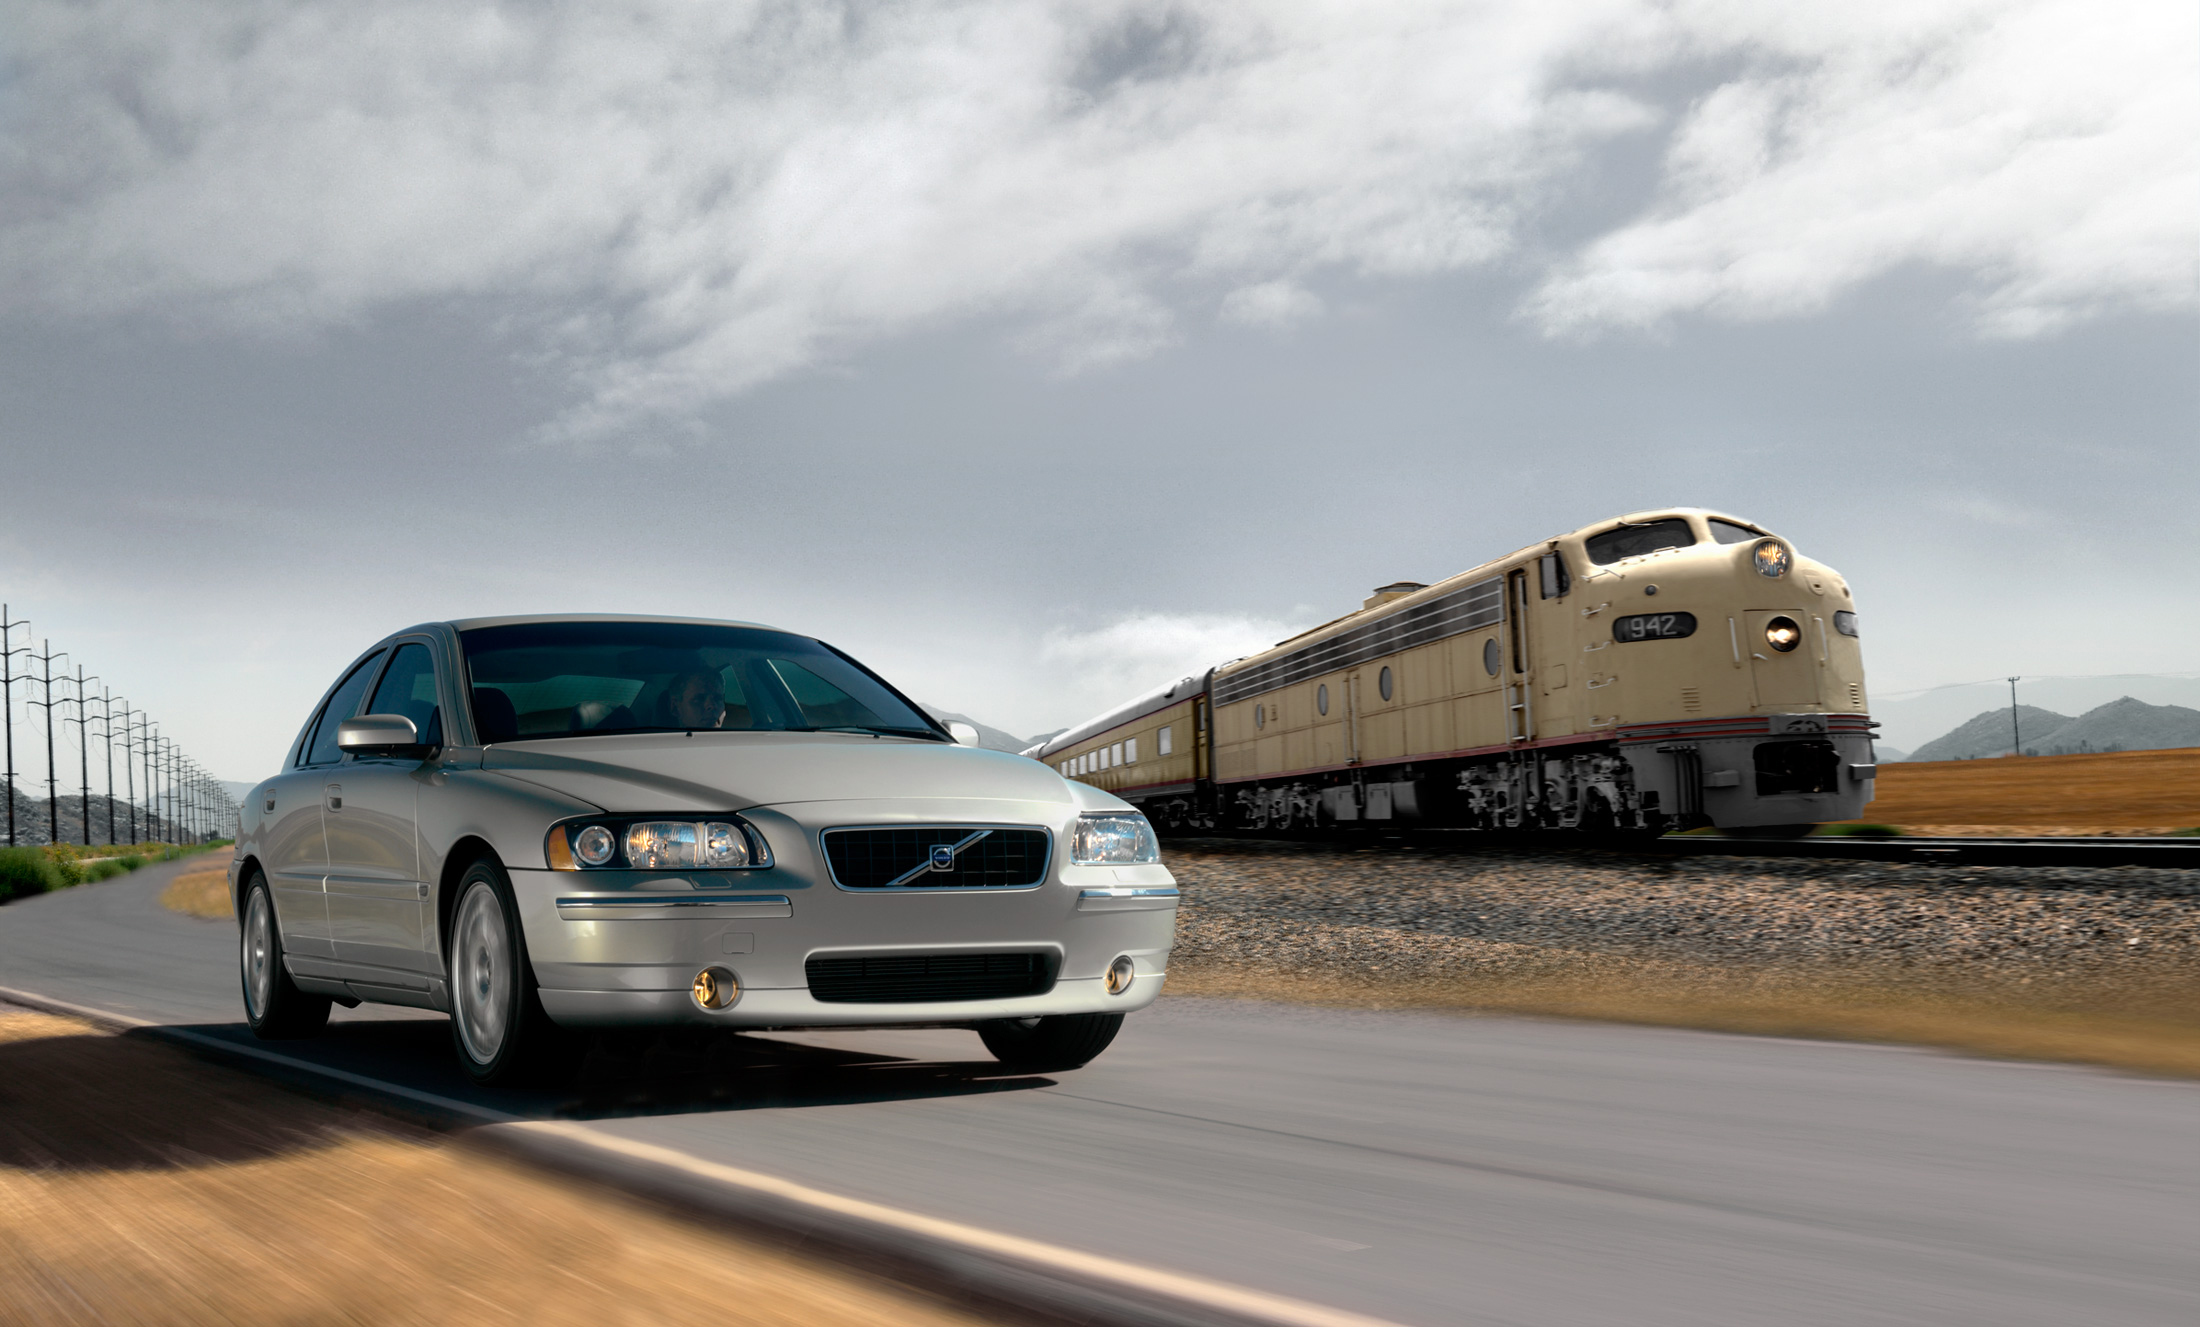 Train-06